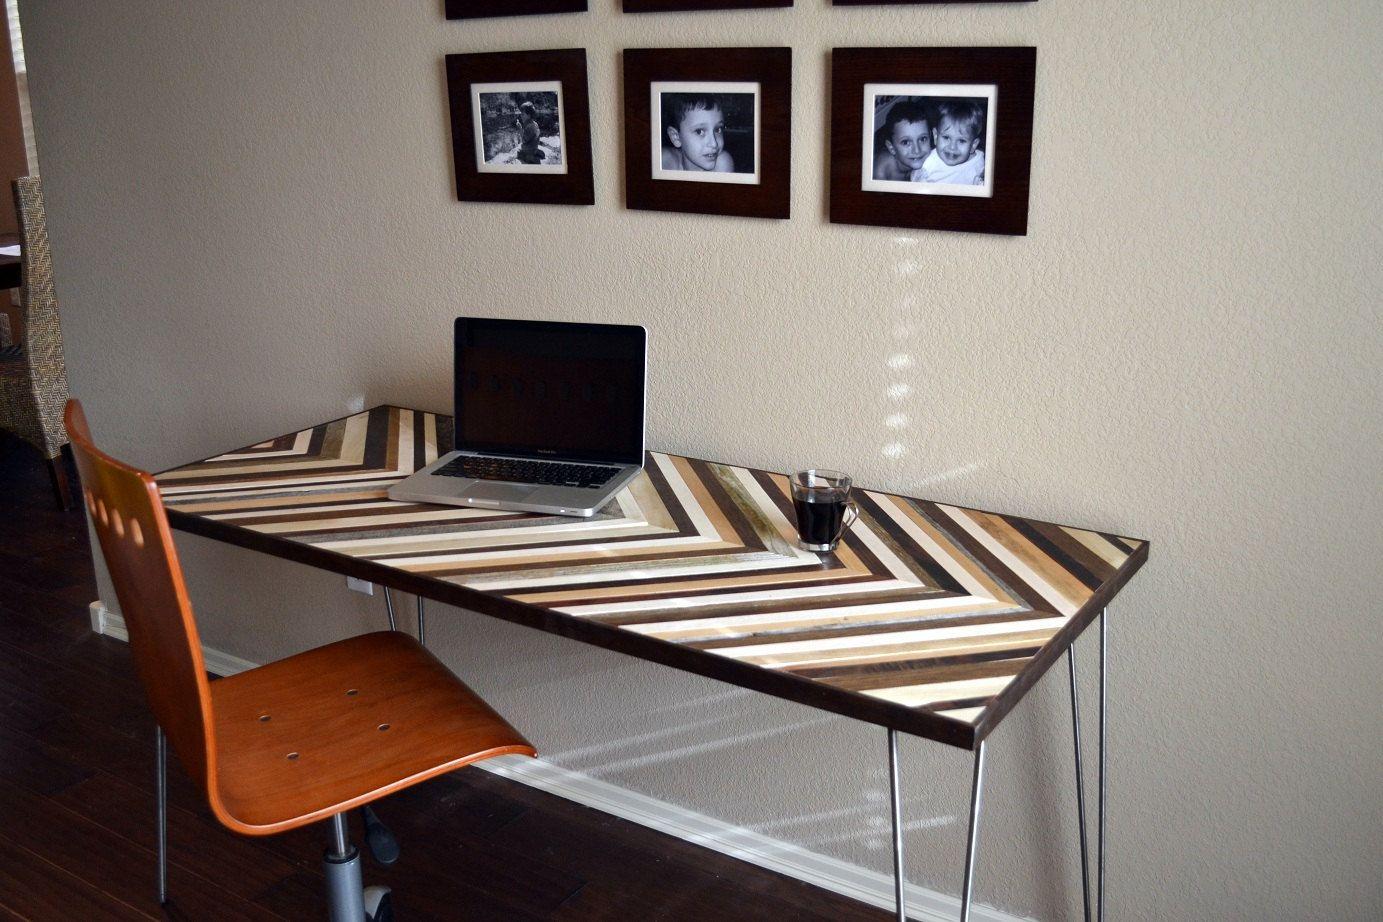 reclaimed wood furniture etsy. Chevron Desk With Hairpin Legs - Wood Table Reclaimed Furniture Etsy